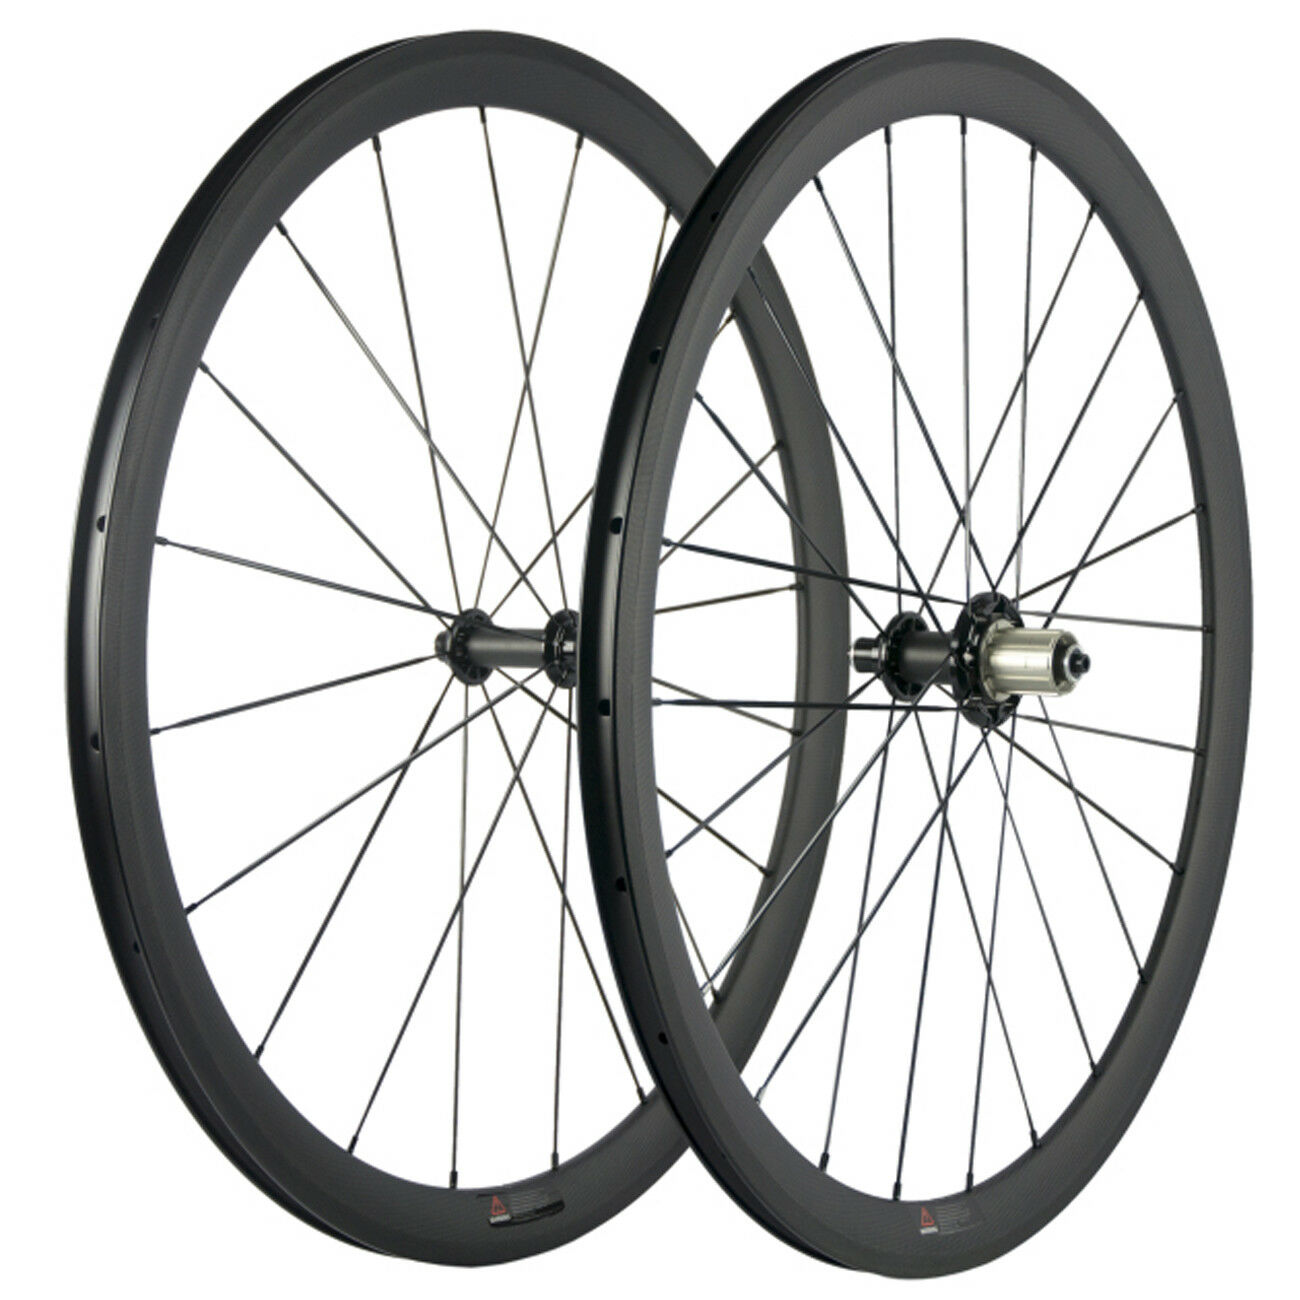 700C Clincher Carbon Fiber Wheels 38mm Wheel R51 Carbon  Hub Road Bike Wheelset  online retailers